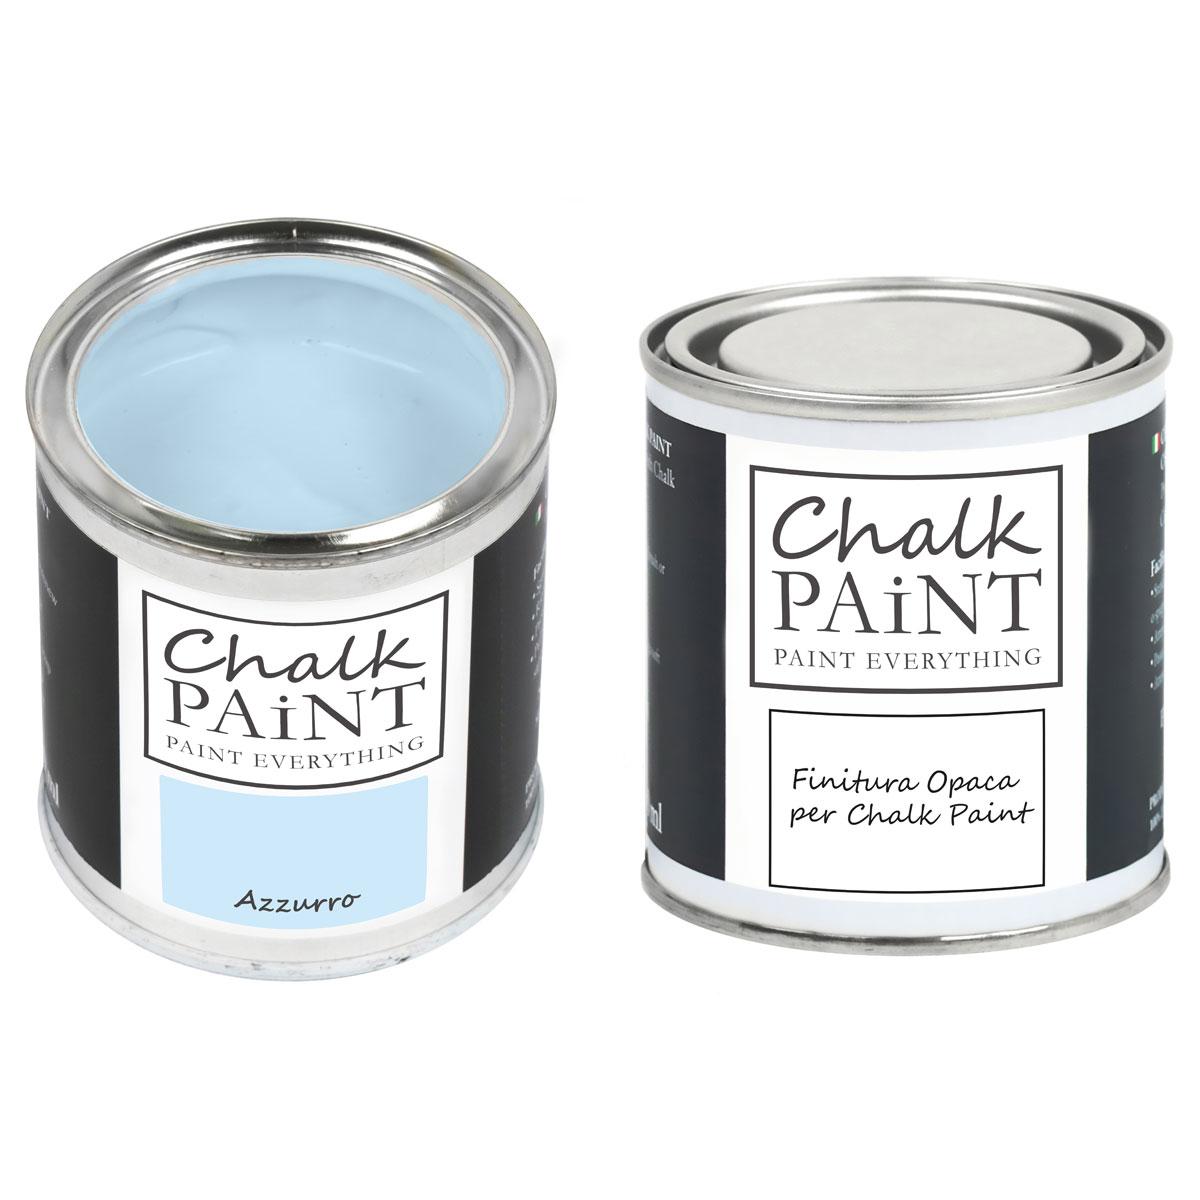 Chalk Paint azzurro paint magic